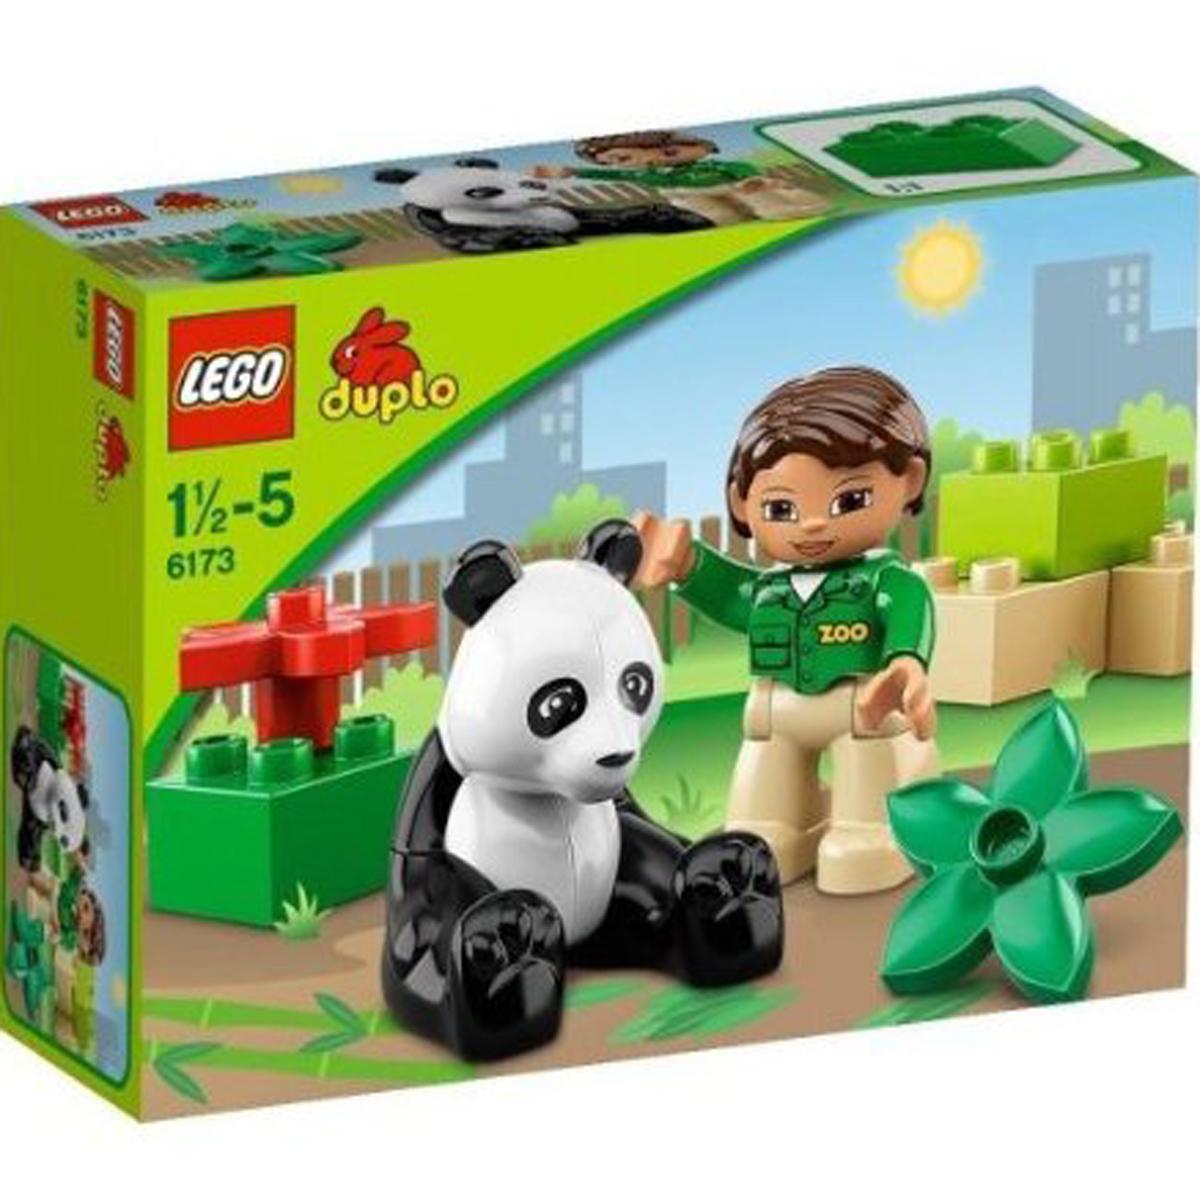 do-choi-lego-6173